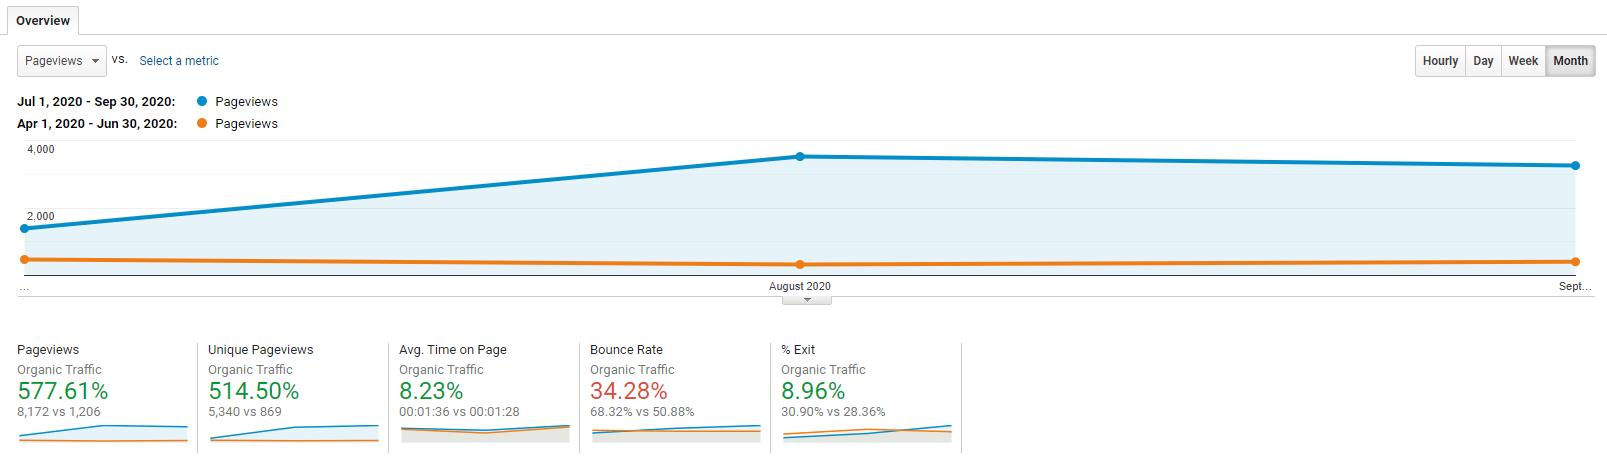 Client Organic Traffic Comparison